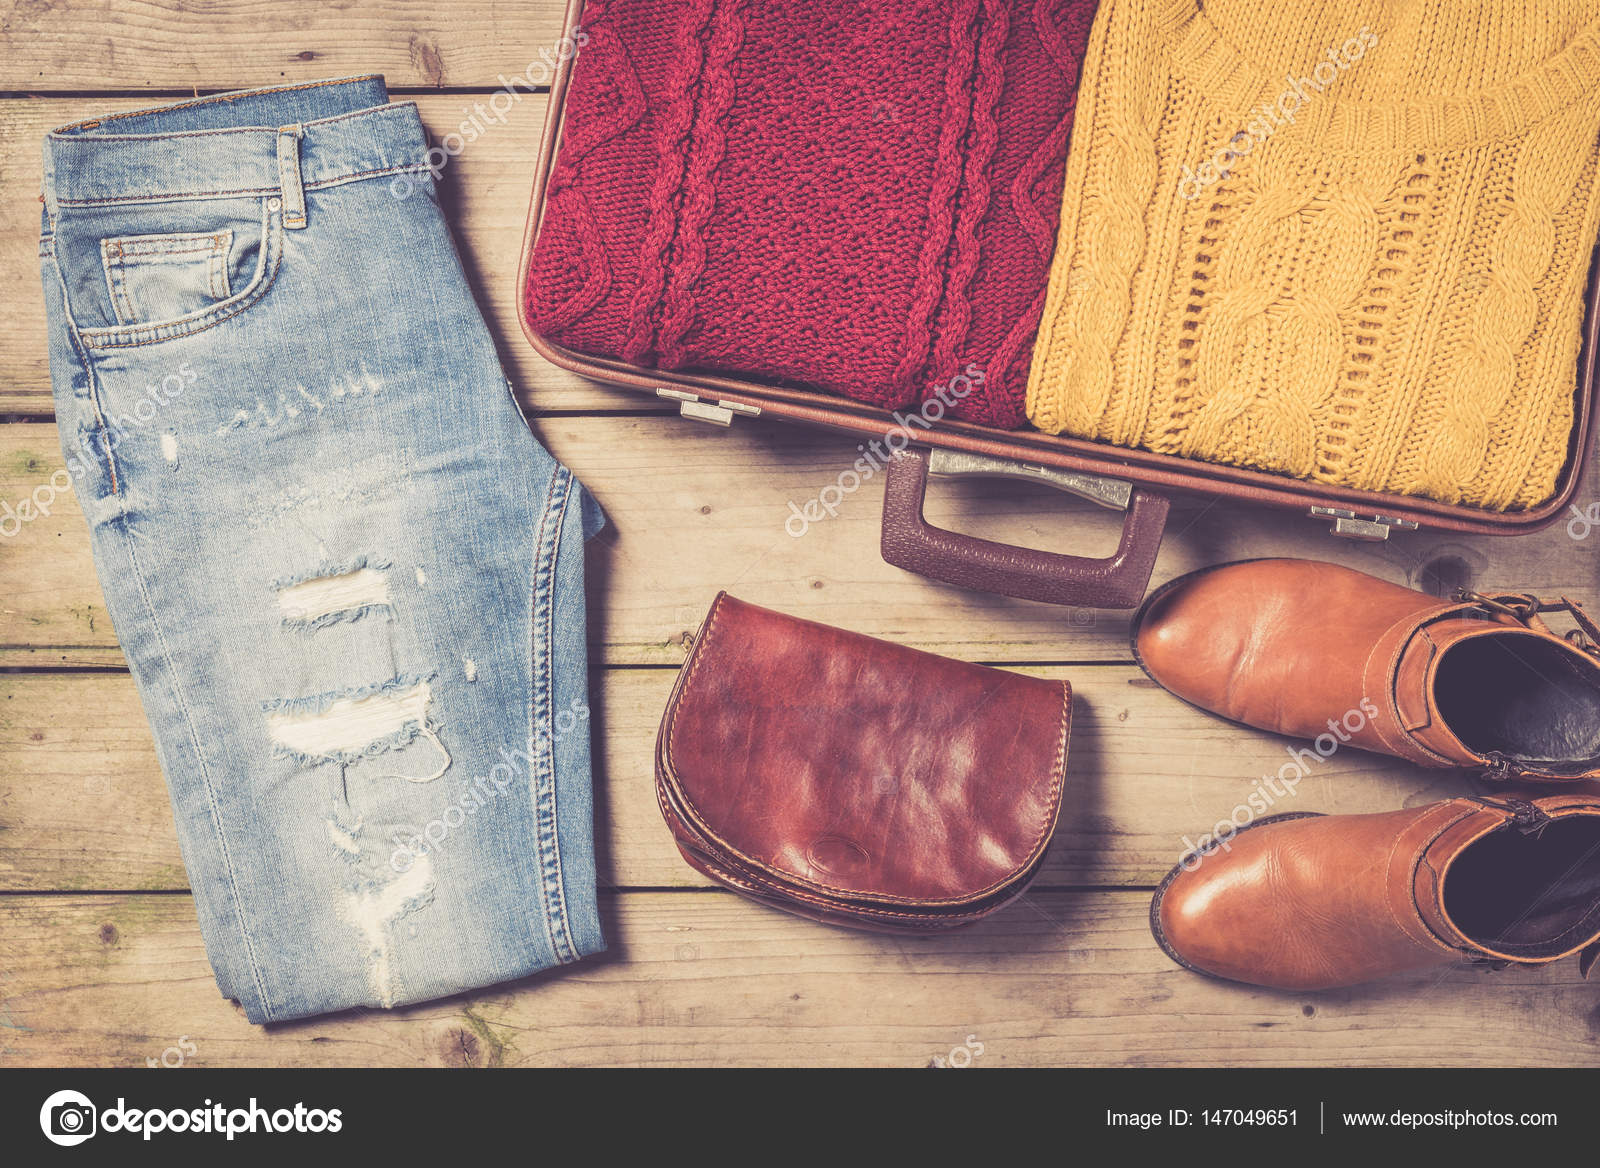 78b1149f0dd0 Ανοιχτό βαλίτσα με casual Γυναικεία ρούχα — Φωτογραφία Αρχείου ...